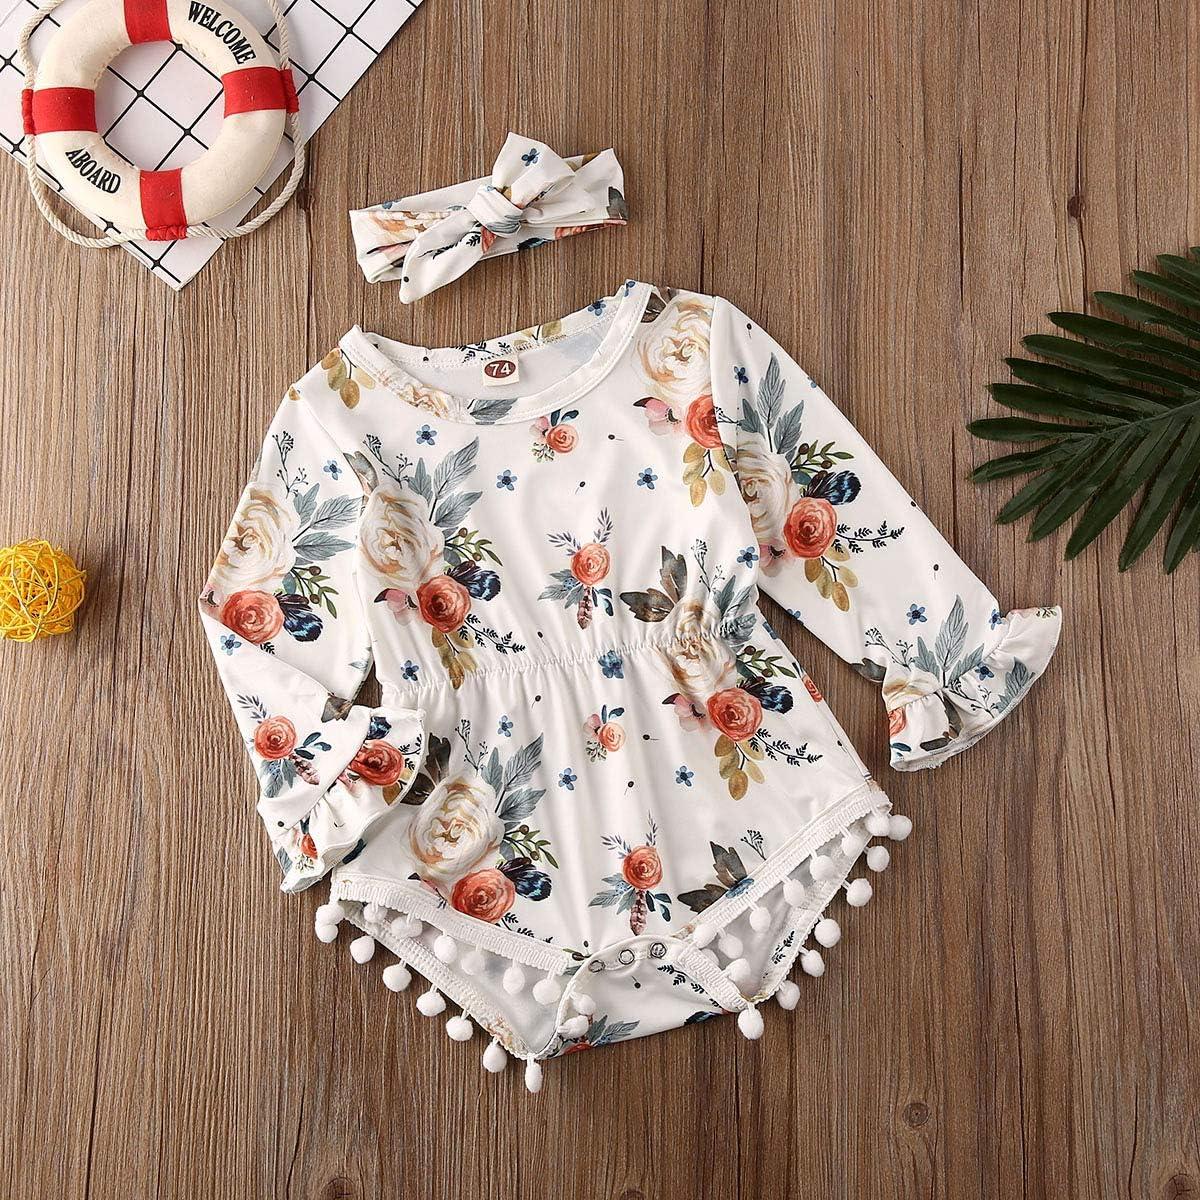 CIPOGL Neugeborenen Kleinkind Baby M/ädchen Strampler Kleidung Floral Quaste Body Overall Stirnband Outfit Sets